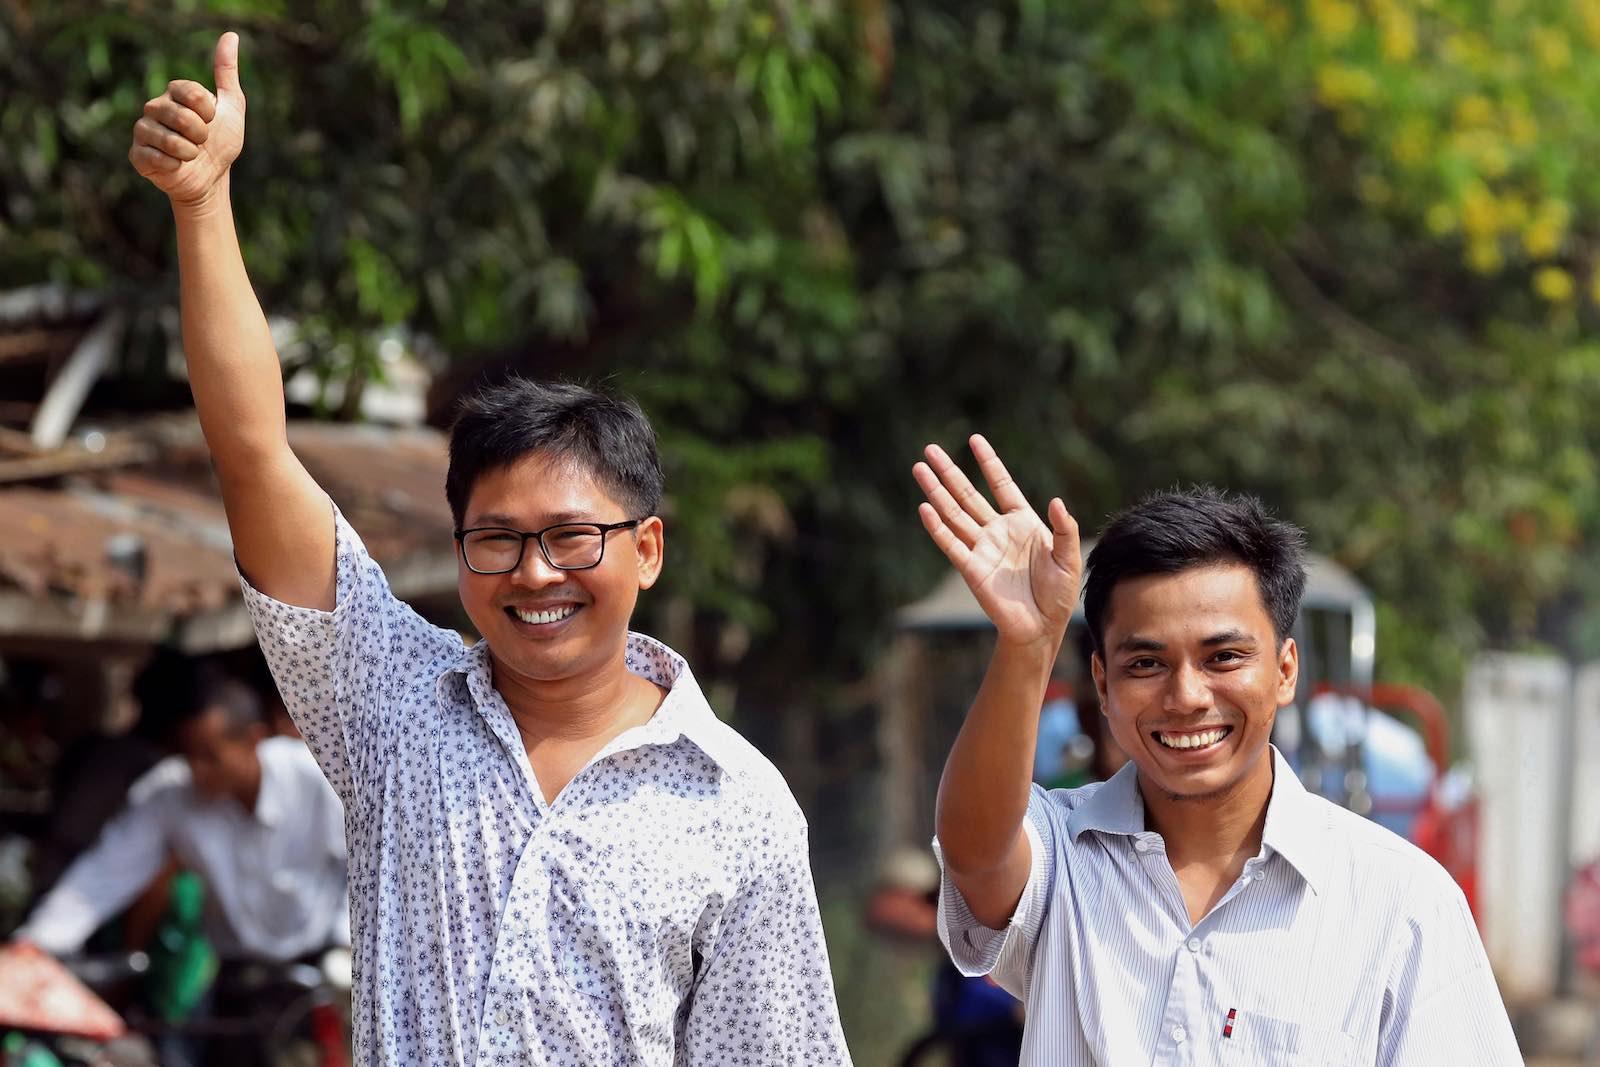 Reuters journalists Wa Lone and Kyaw Soe Oo walk free from Insein prison (Photo: Ann Wang via Getty)